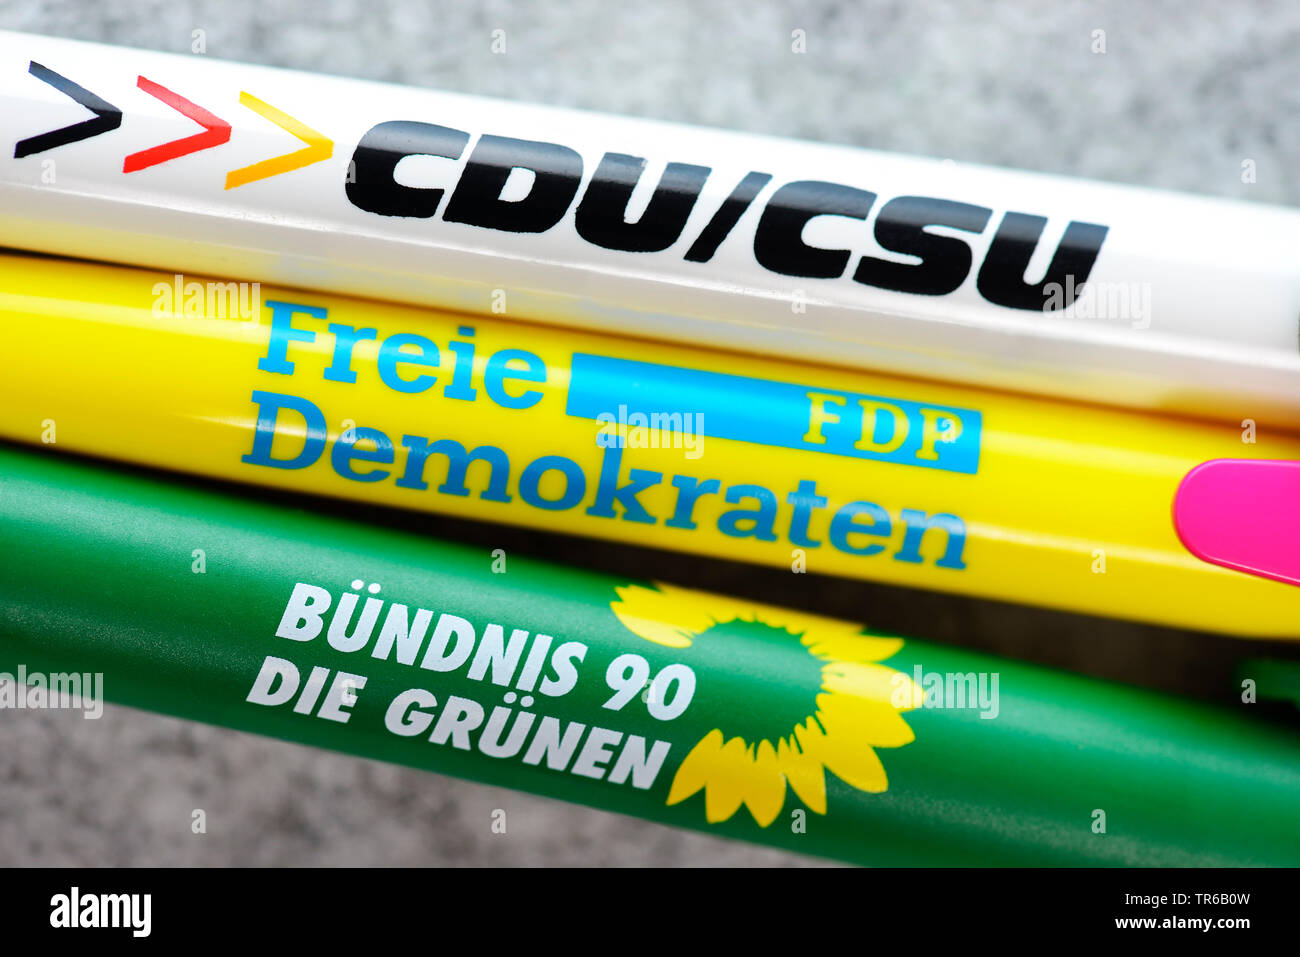 ball-pens of the partys CDU/CSU, FDP and Buendnis 90 die Gruenen, jamaica coalation, Germany Stock Photo